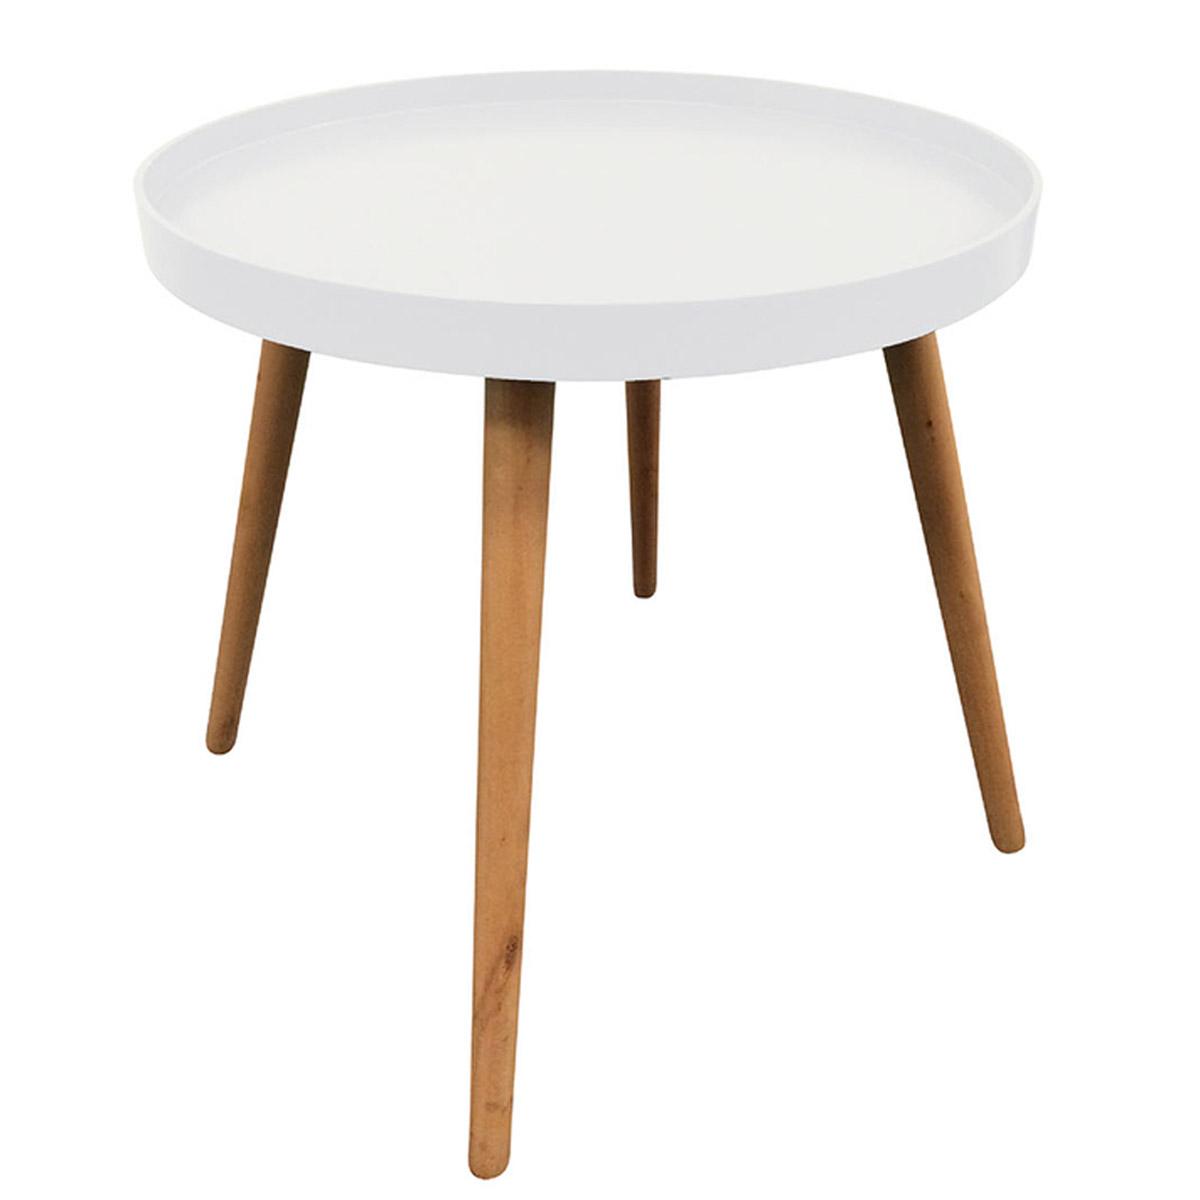 Table ronde bois \'Boho\' blanc - 50x44 cm - [R2394]